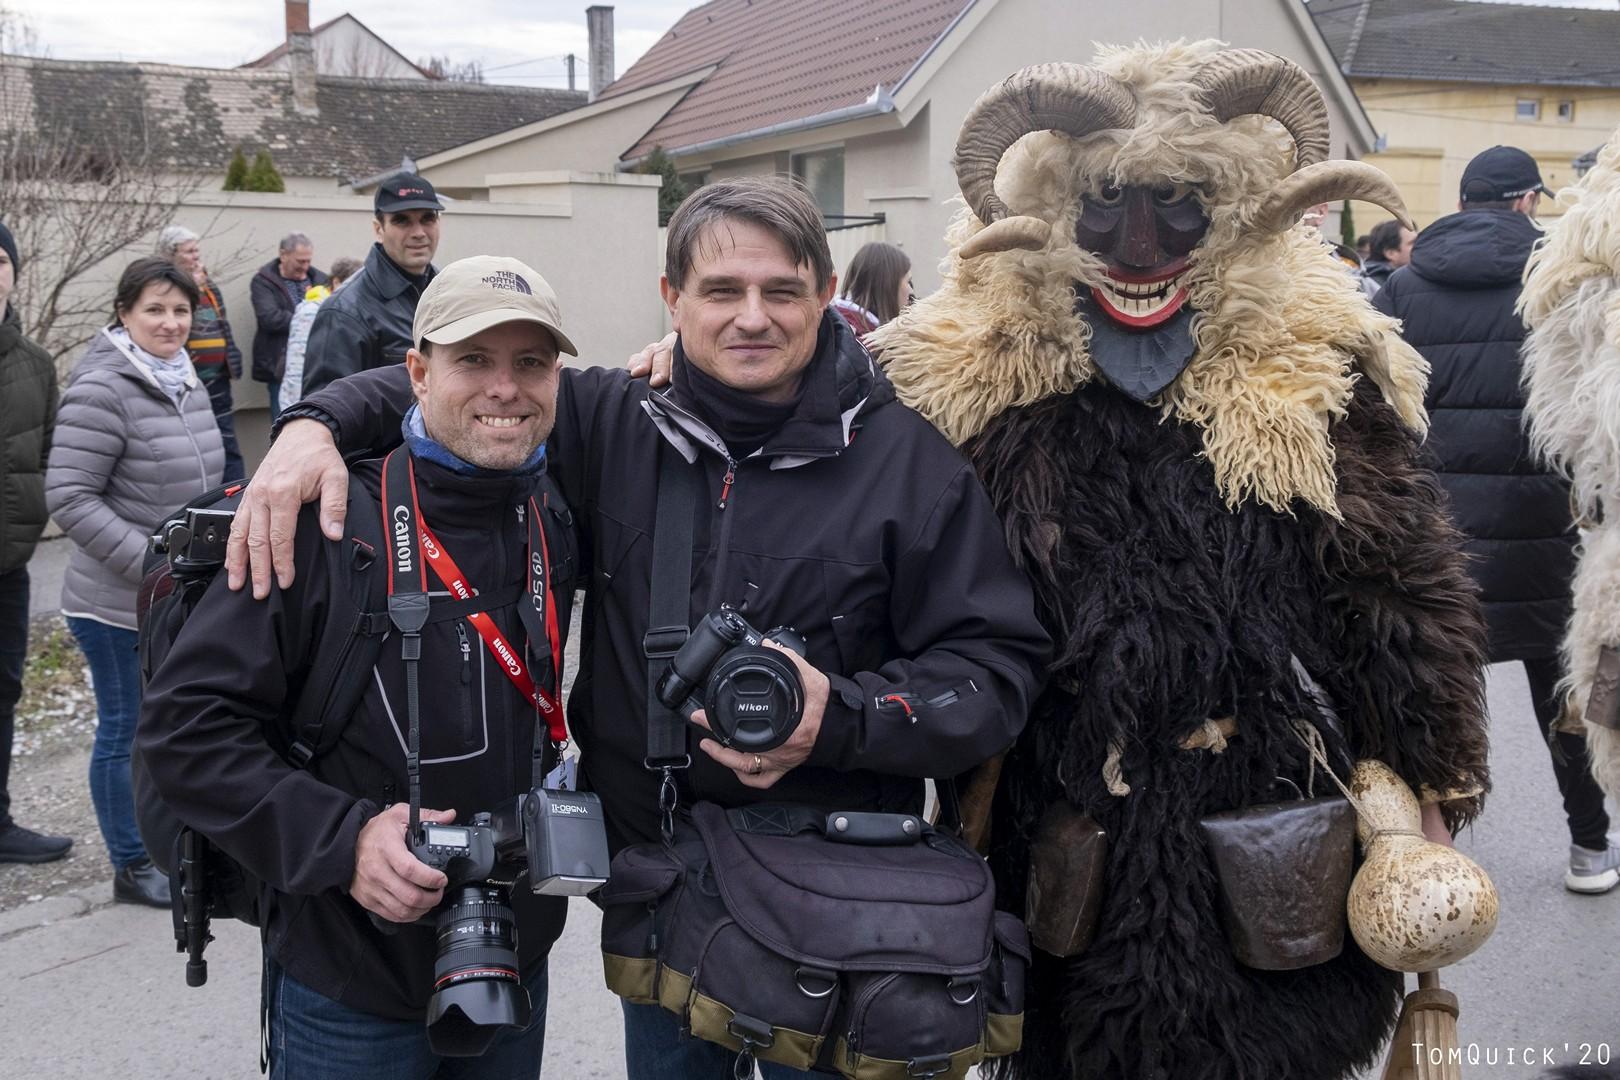 Busójárás (2020) Horvai Valér fotós kollégámmal